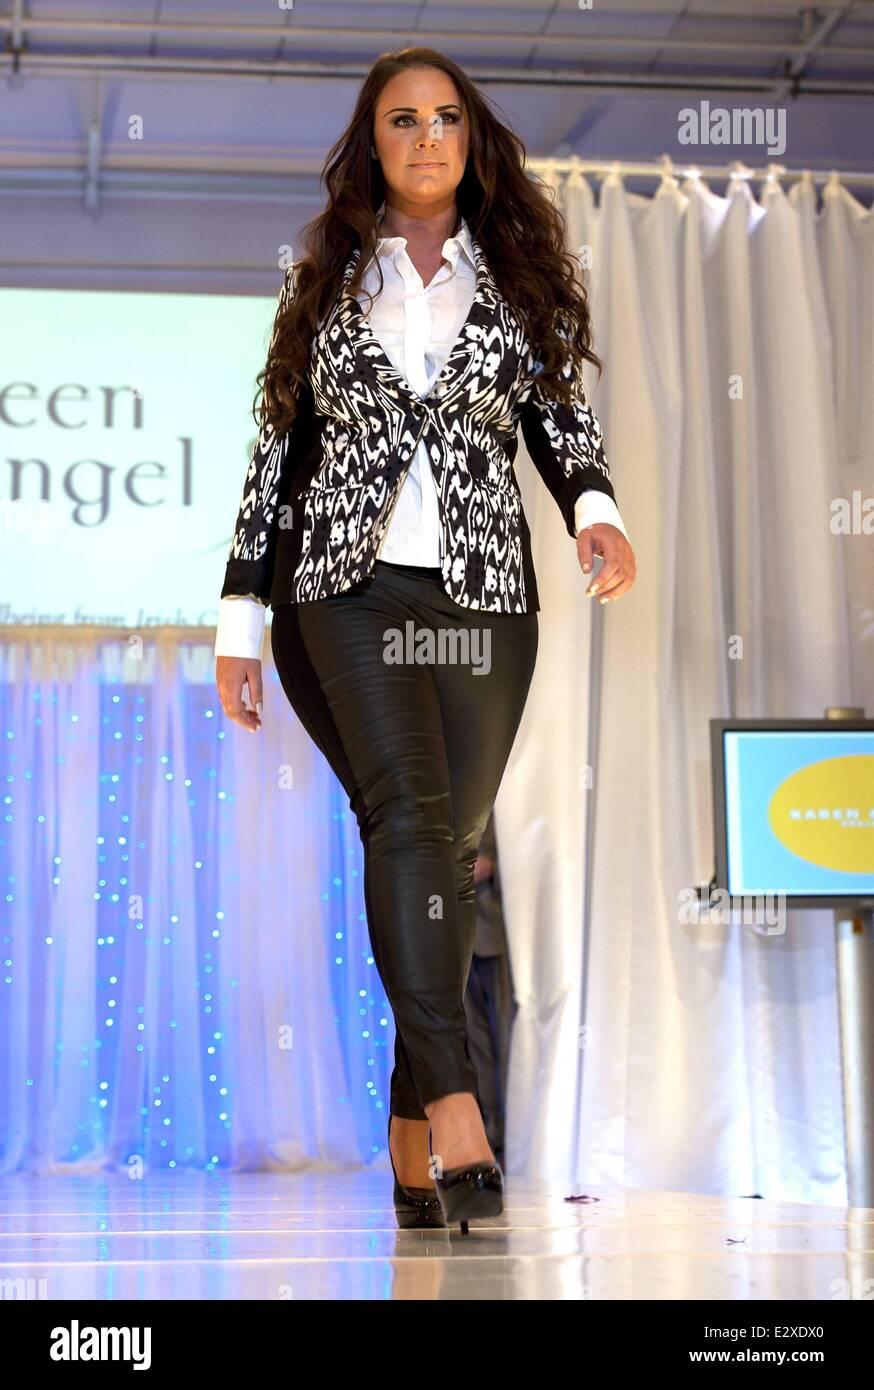 Victoria's Secret Fashion Show 2013: Snow Angel Behati 32